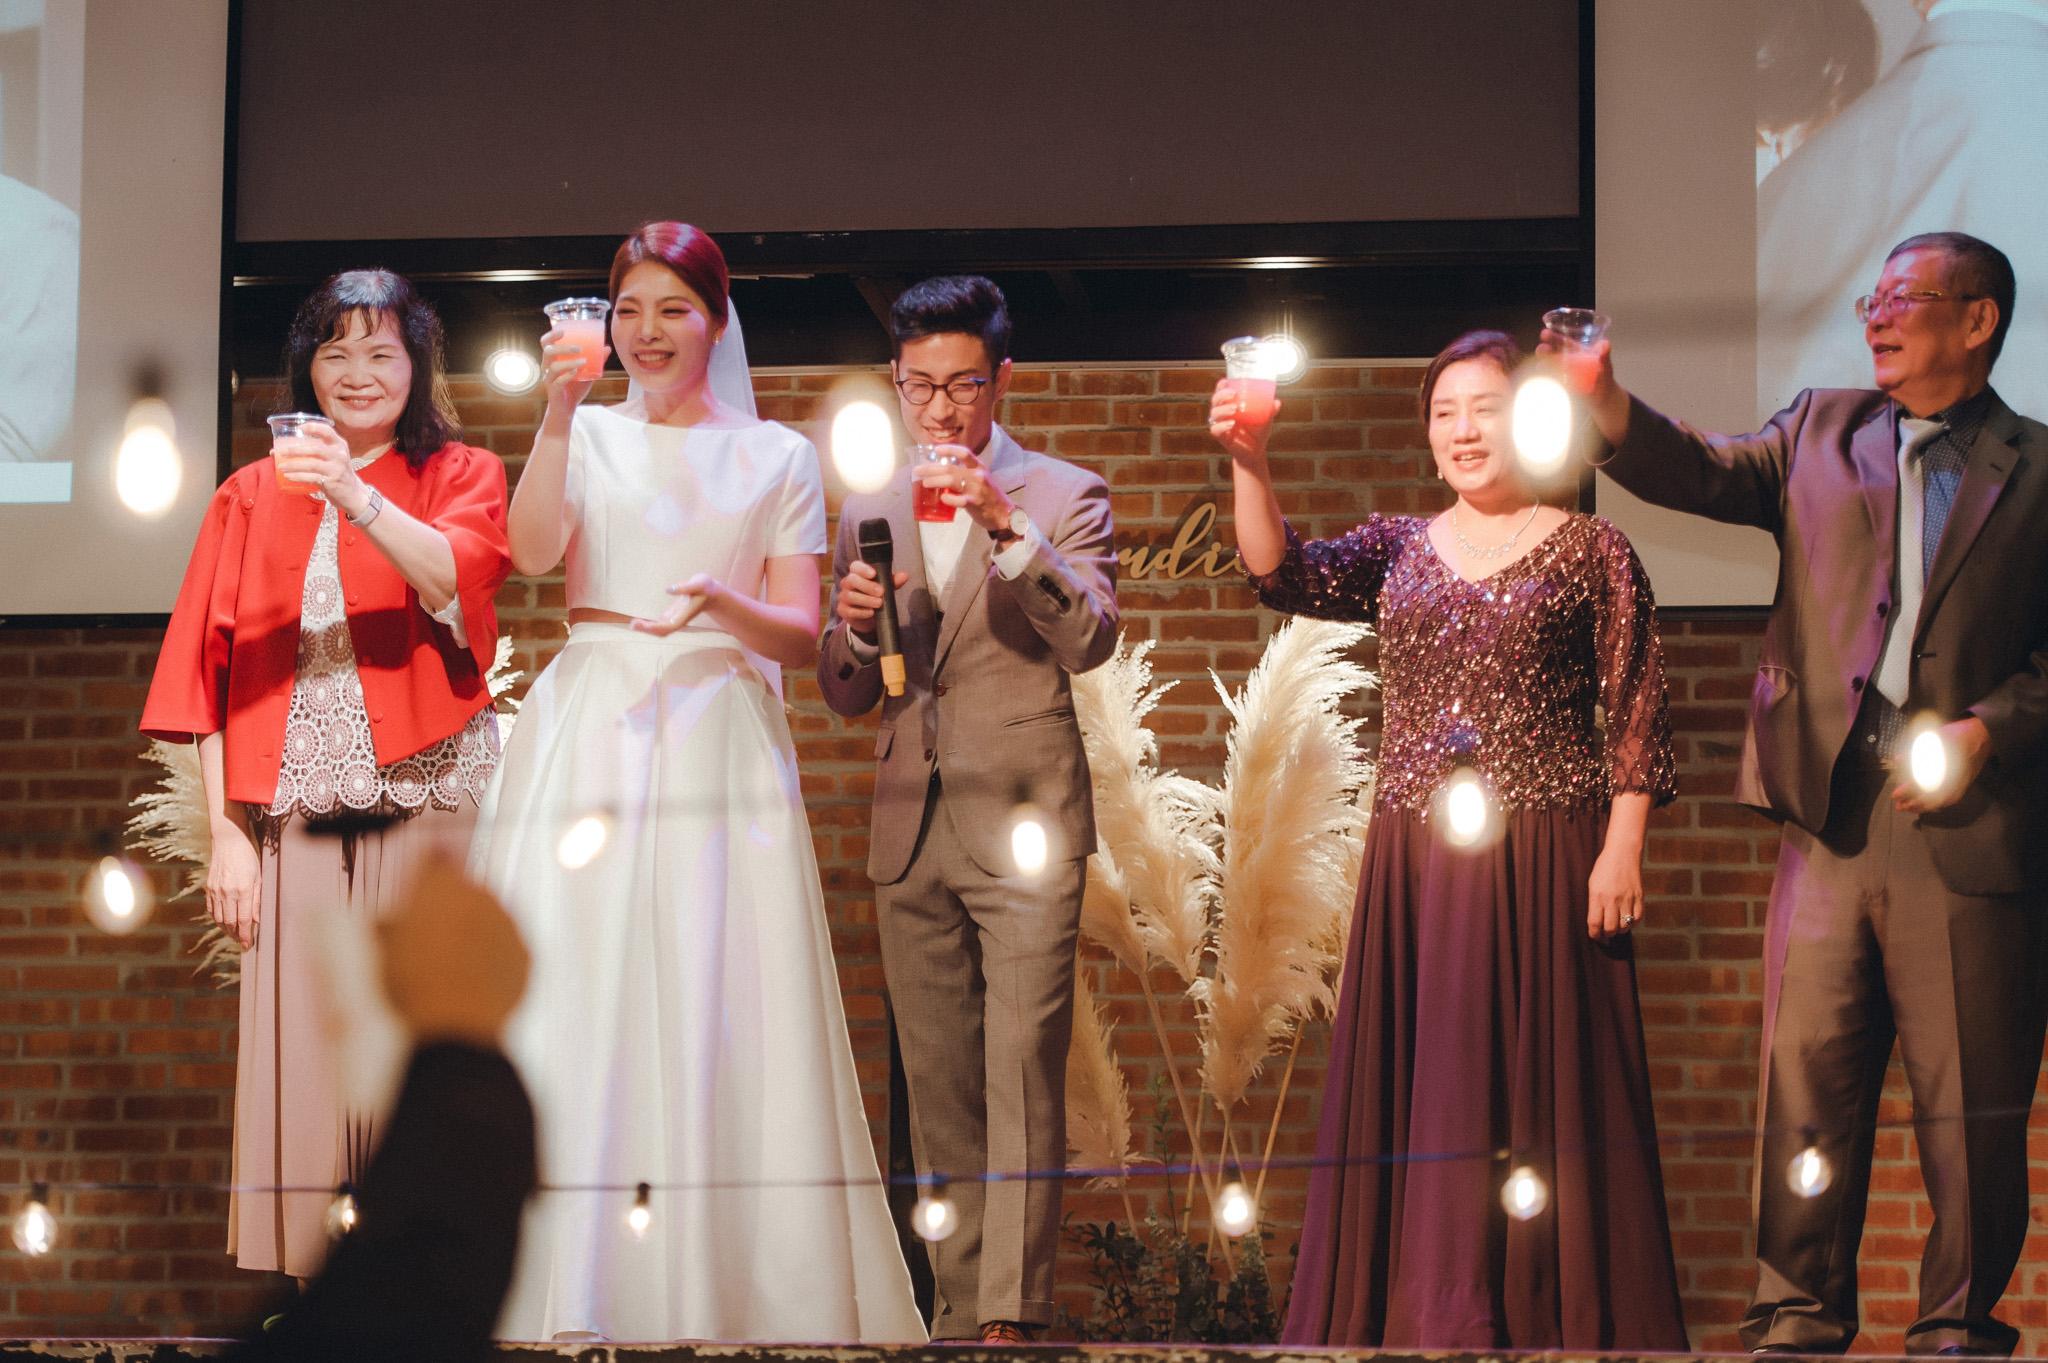 EW 台北婚攝 居米 濟南教會 Brick Yard 33 美軍俱樂部 婚禮 婚宴-83